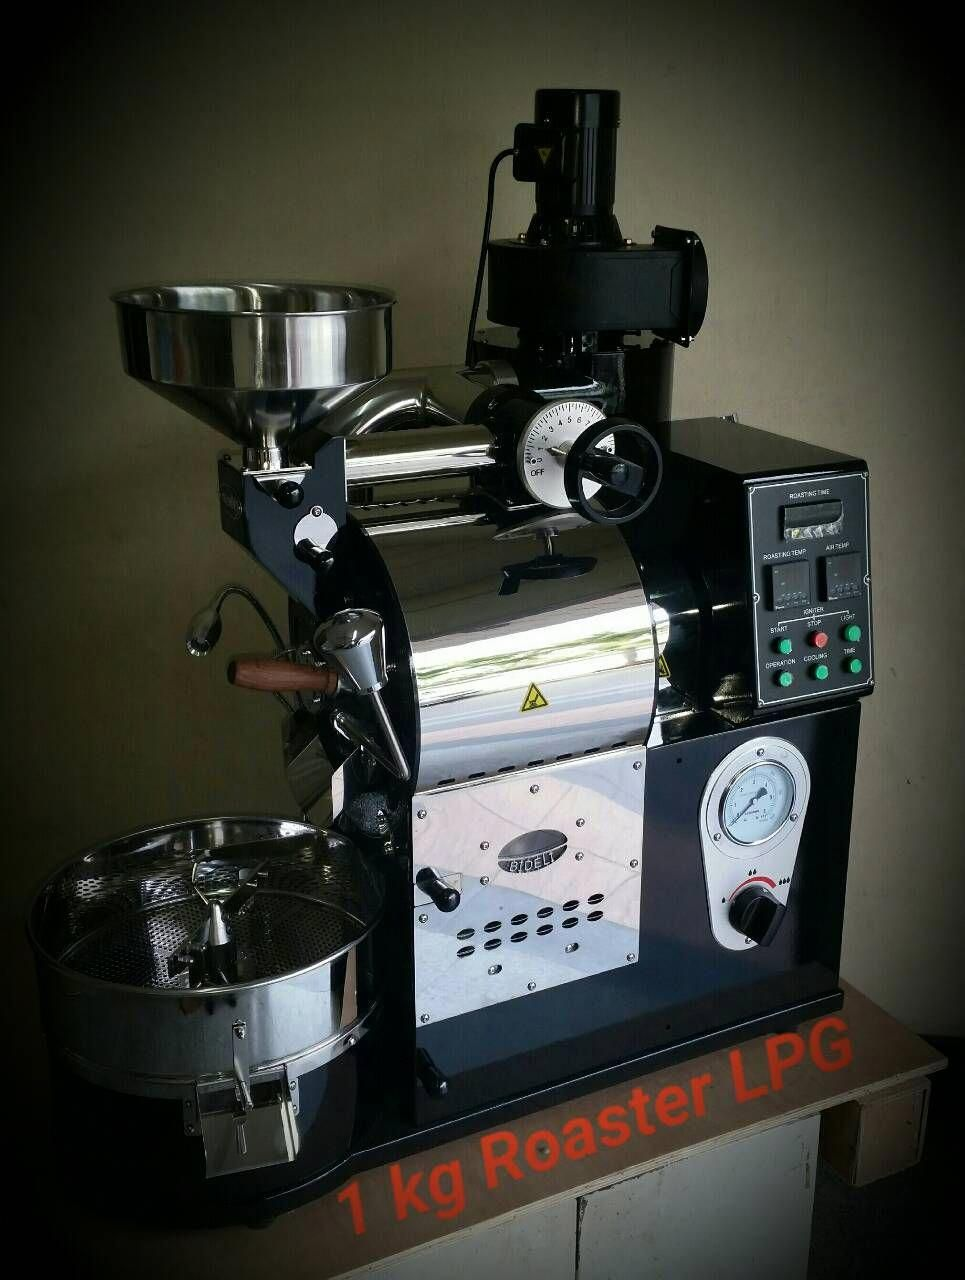 26 Awesome Coffee Roaster Industrial Coffee Roasters Companion Coffeestand Coffeescrub Coffeeroaster With Images Coffee Roasting Machine Coffee Roasters Coffee Roasting